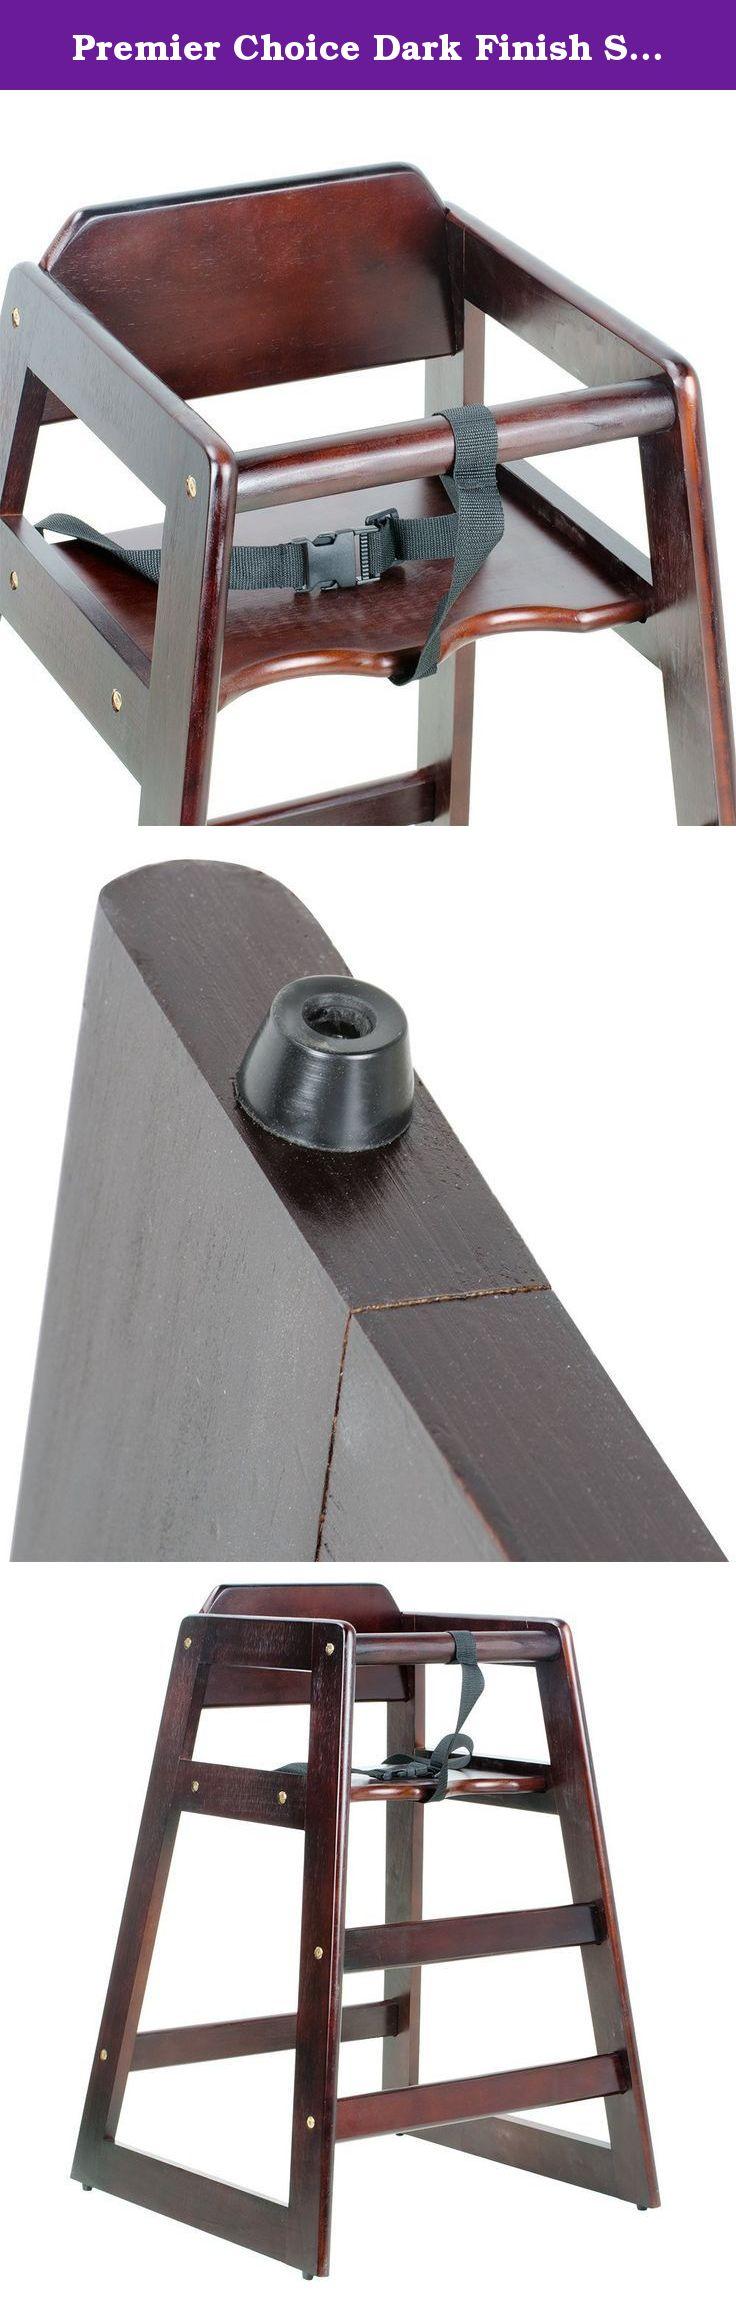 Premier Choice Dark Finish Stacking Restaurant Wood High Chair